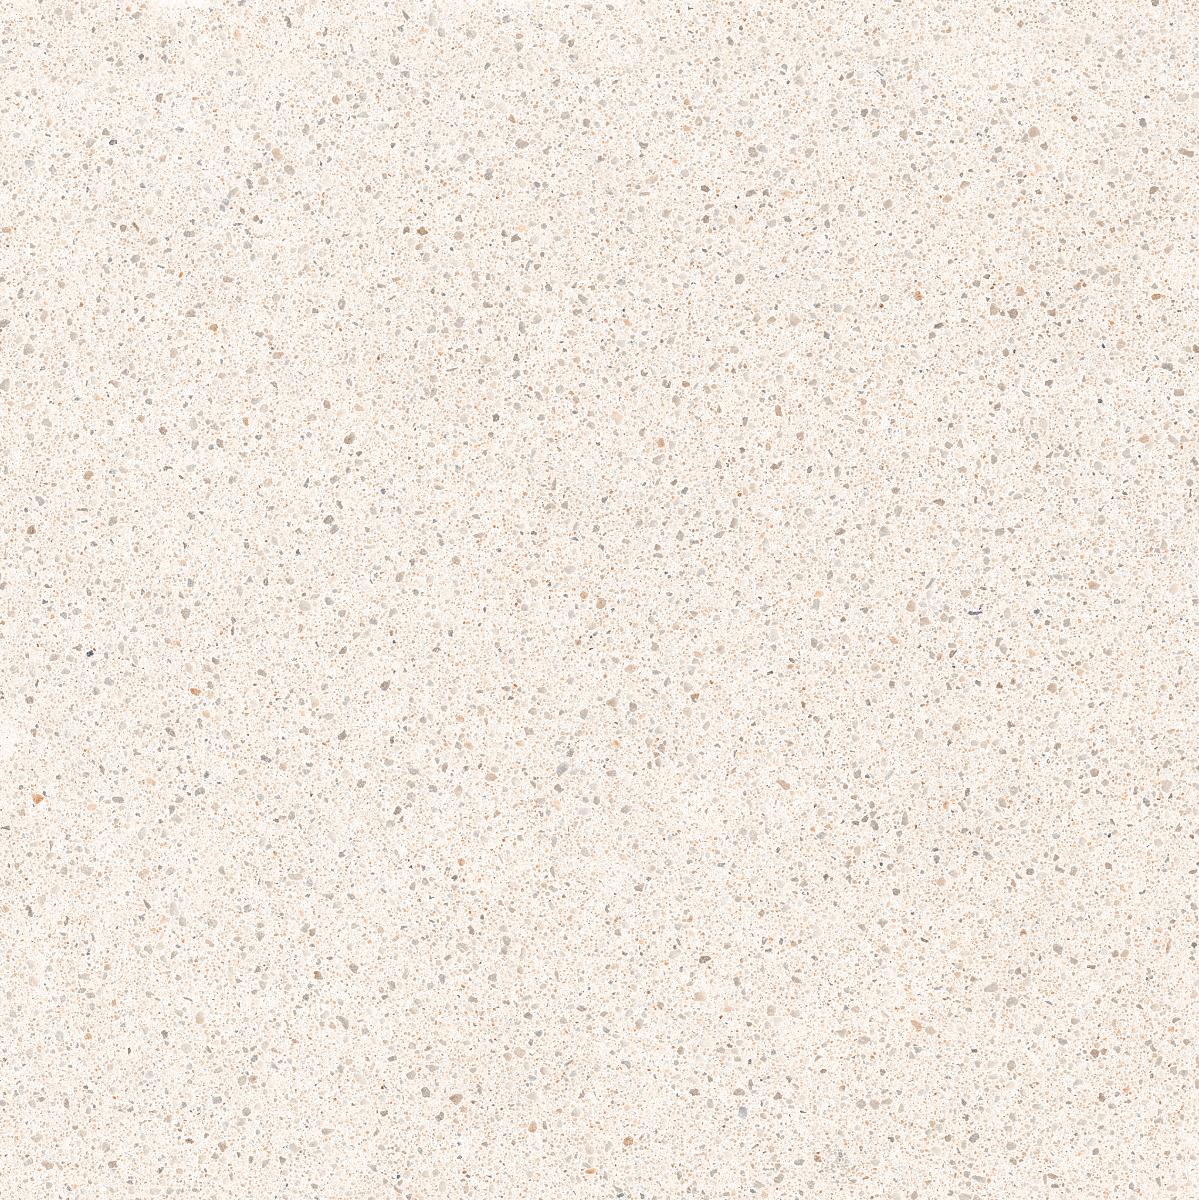 PGVT Maksi Dot Flake Multi